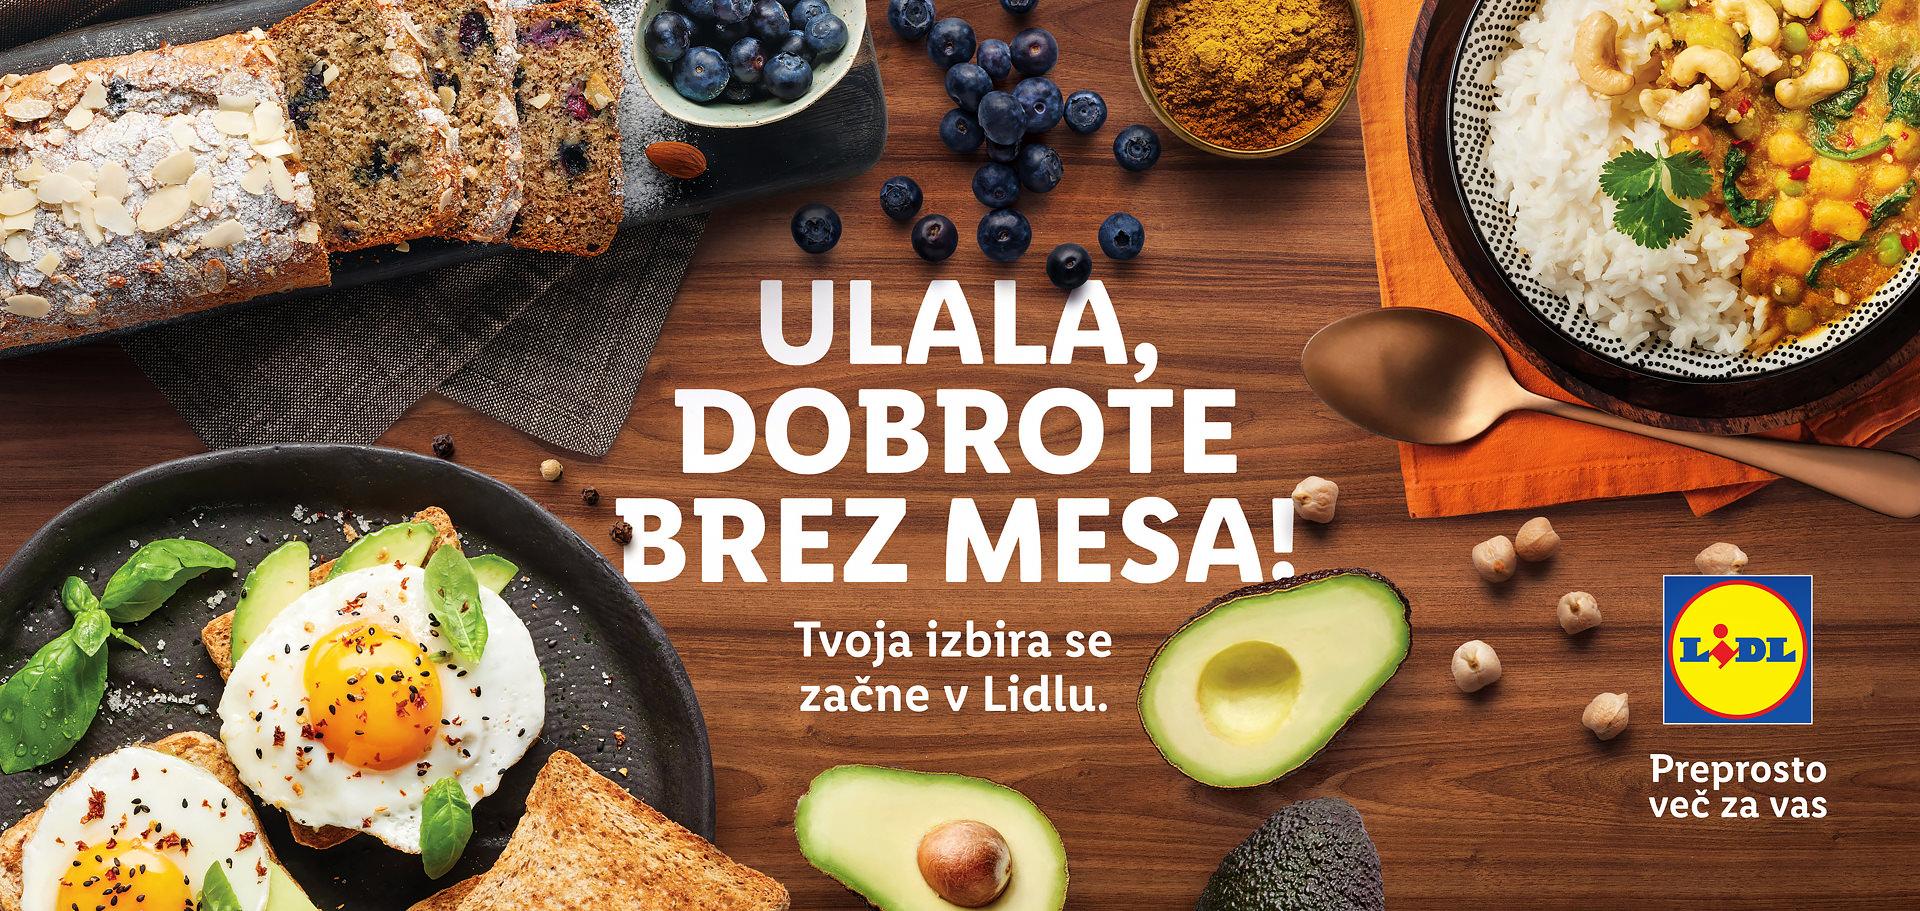 YY_Lidl_Izbira_BB_5x2_Vegetarijansko_01-1